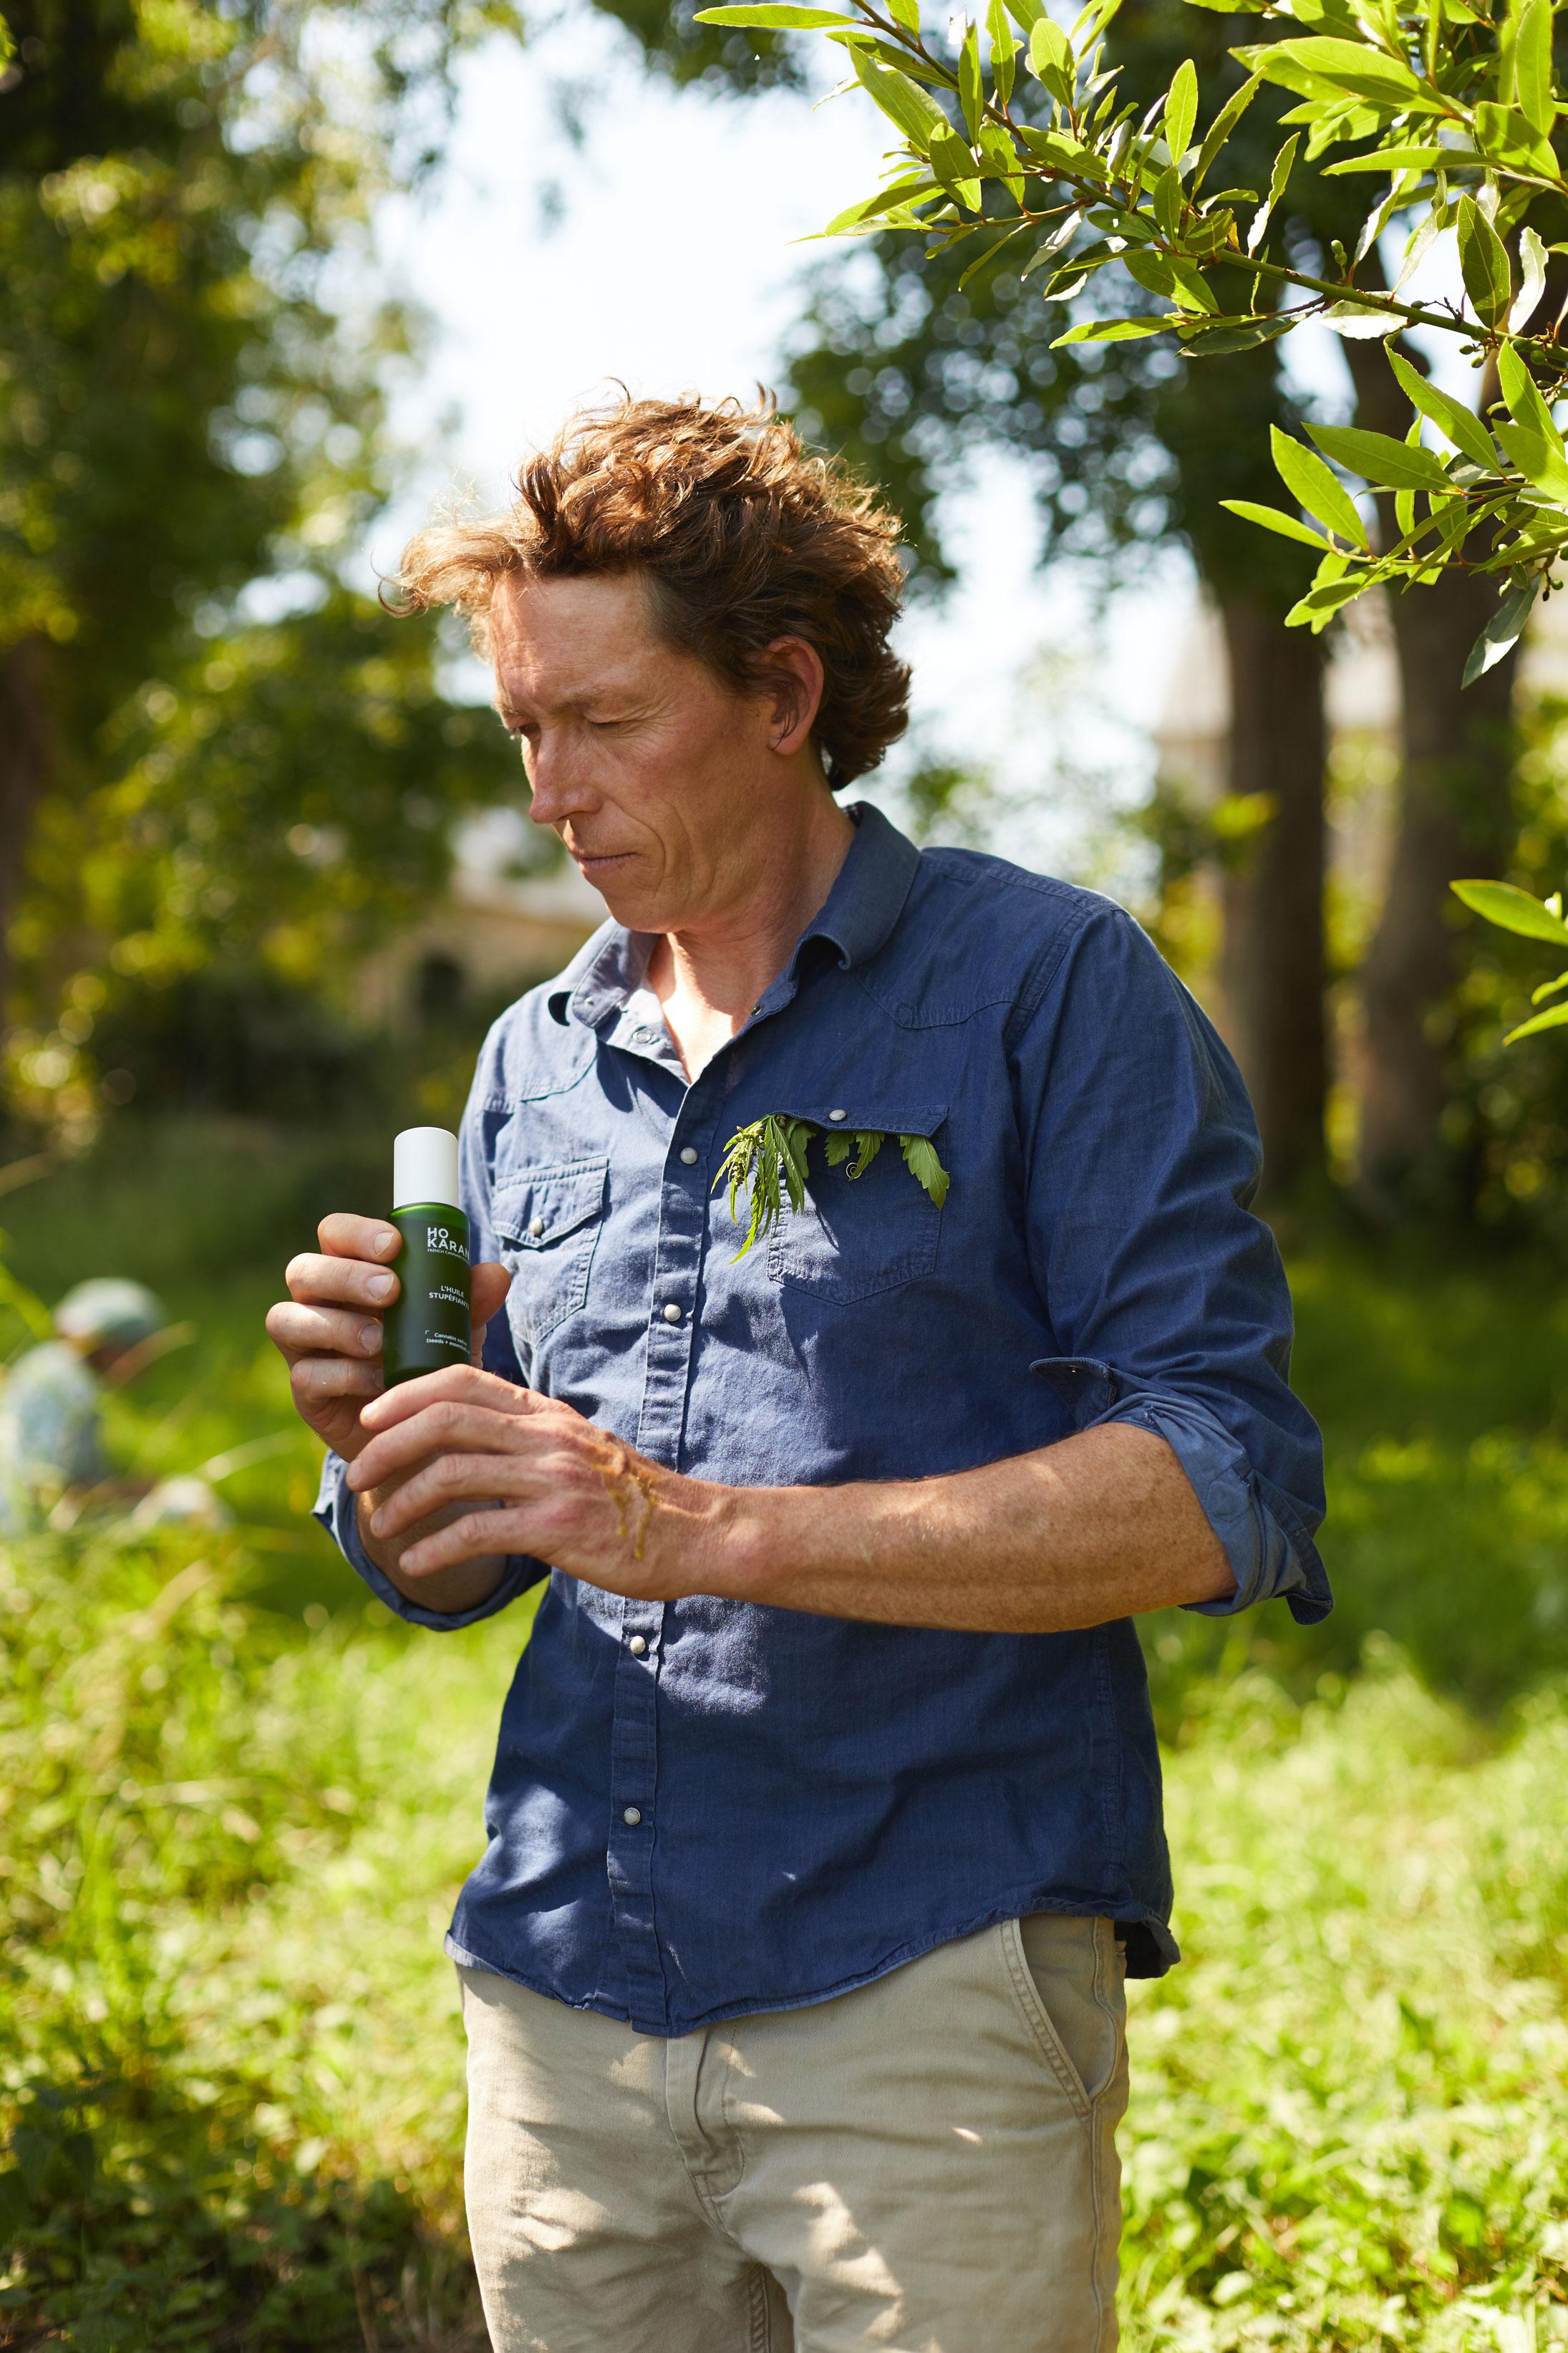 photographe evenementiel reportage agriculteur